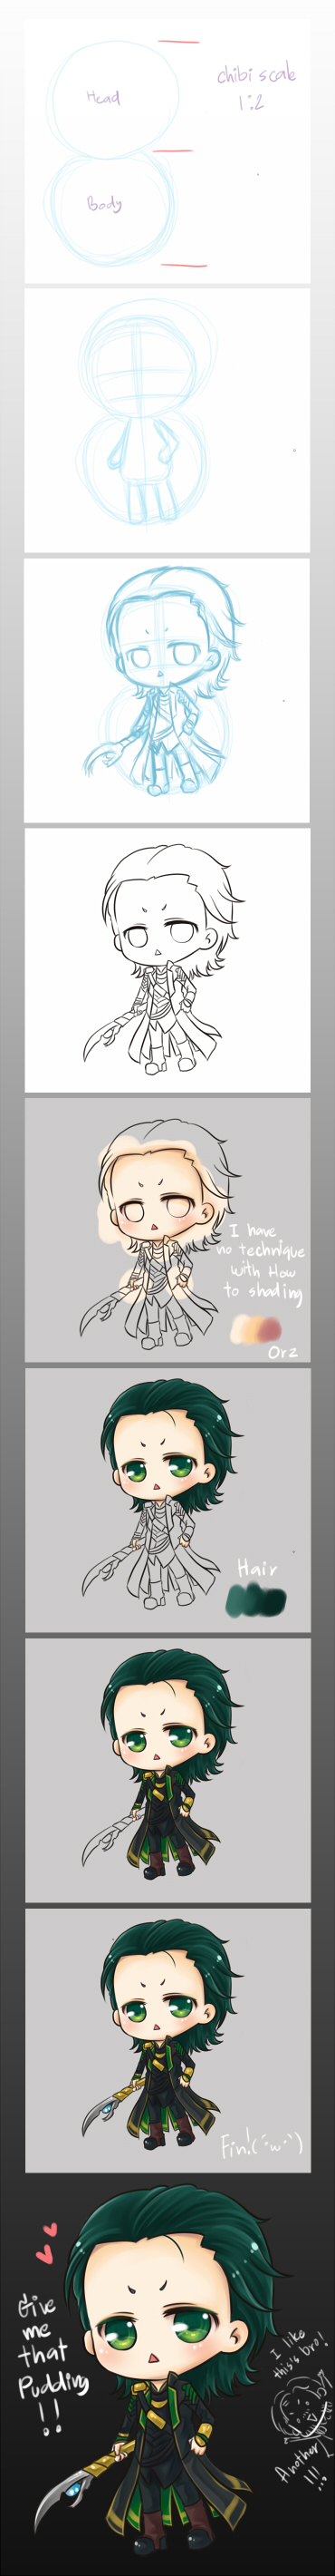 :Loki:How to draw chibi Loki by PrinceOfRedroses